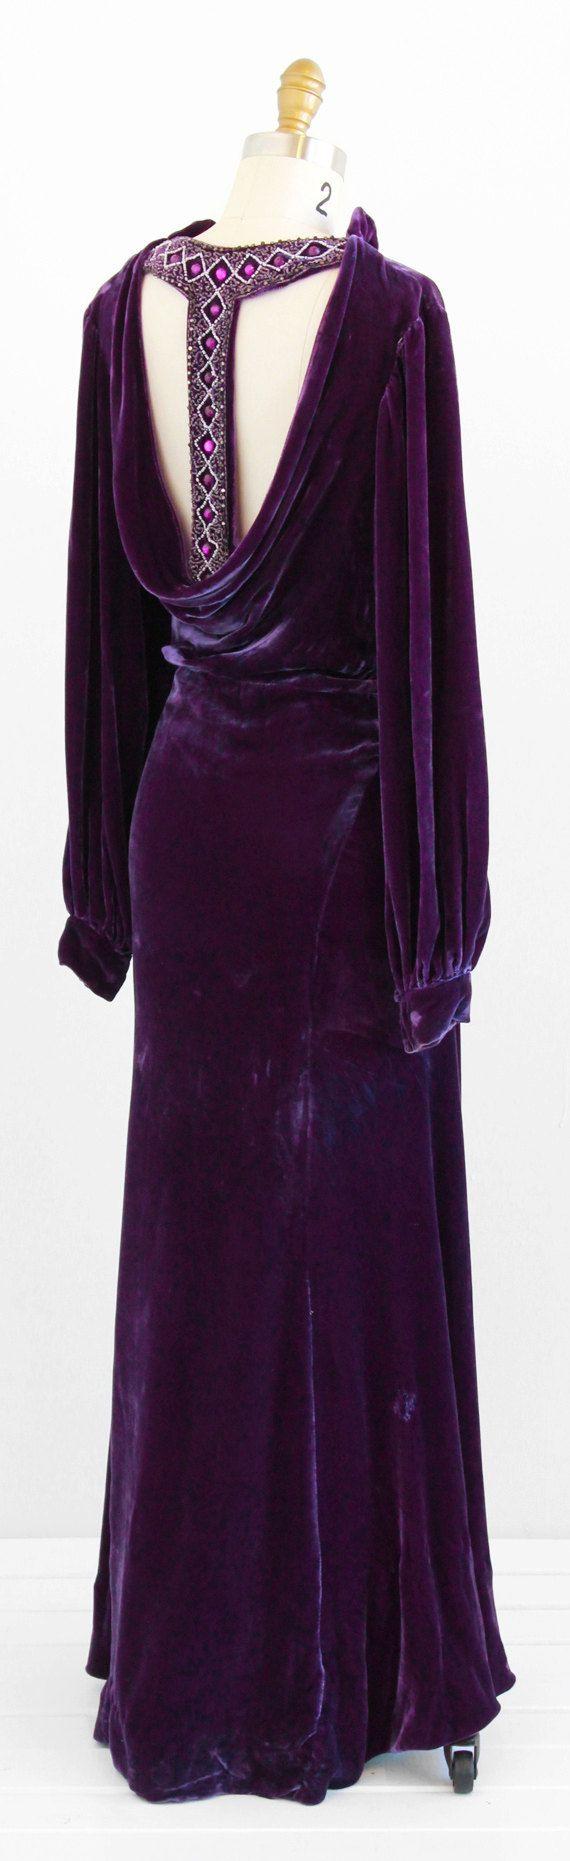 vintage 1930s purple silk velvet evening gown | plunging jeweled back | www.rococovintage.com